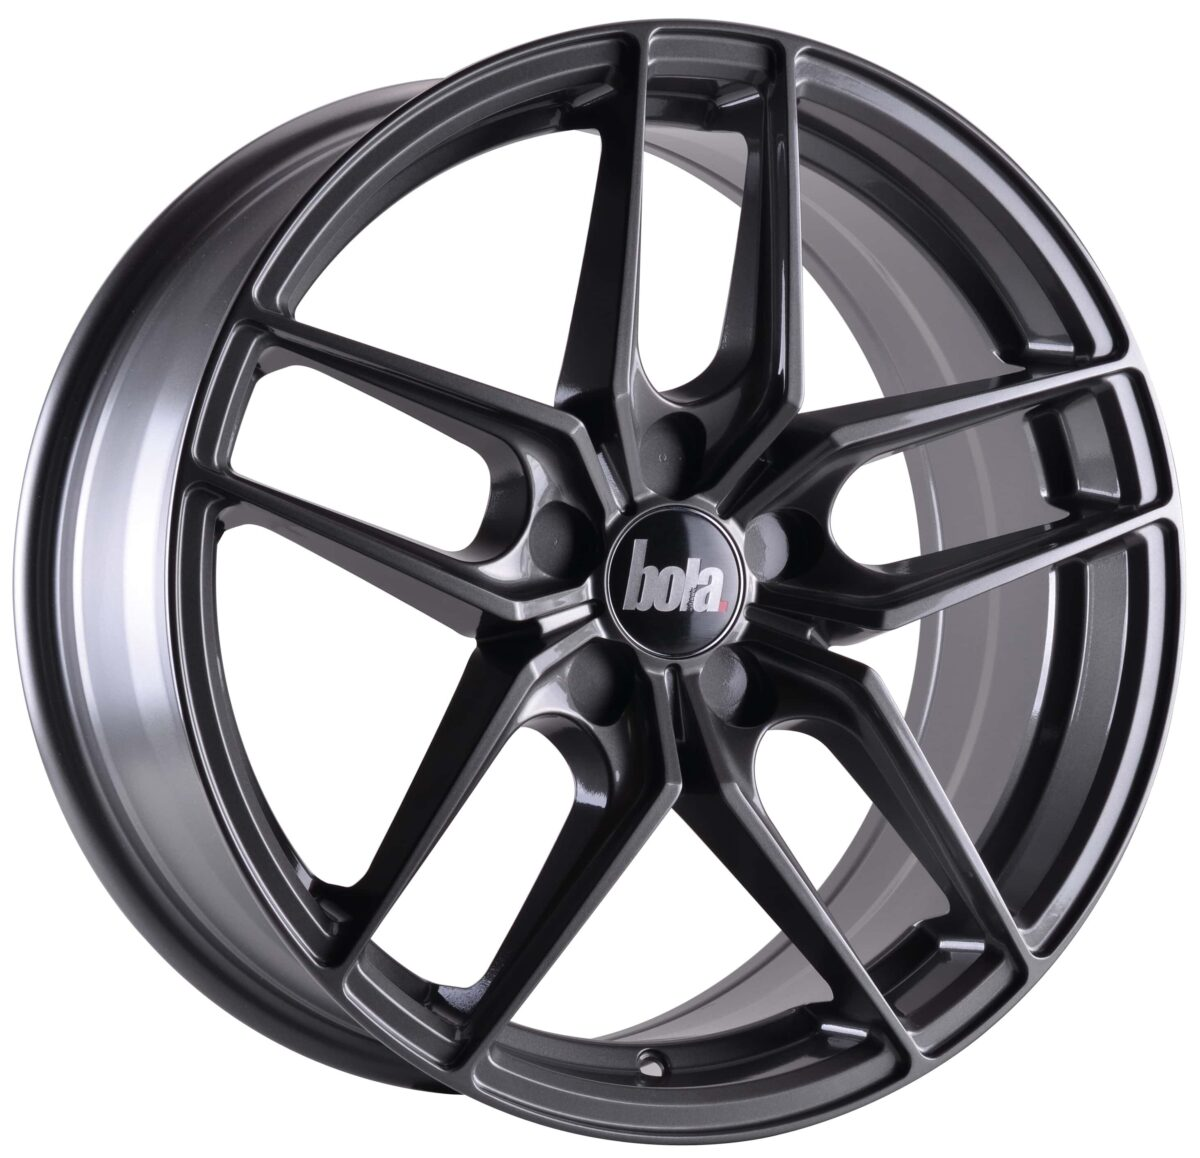 "19"" BOLA B11 Wheels - Gloss Gunmetal - All BMW Models"